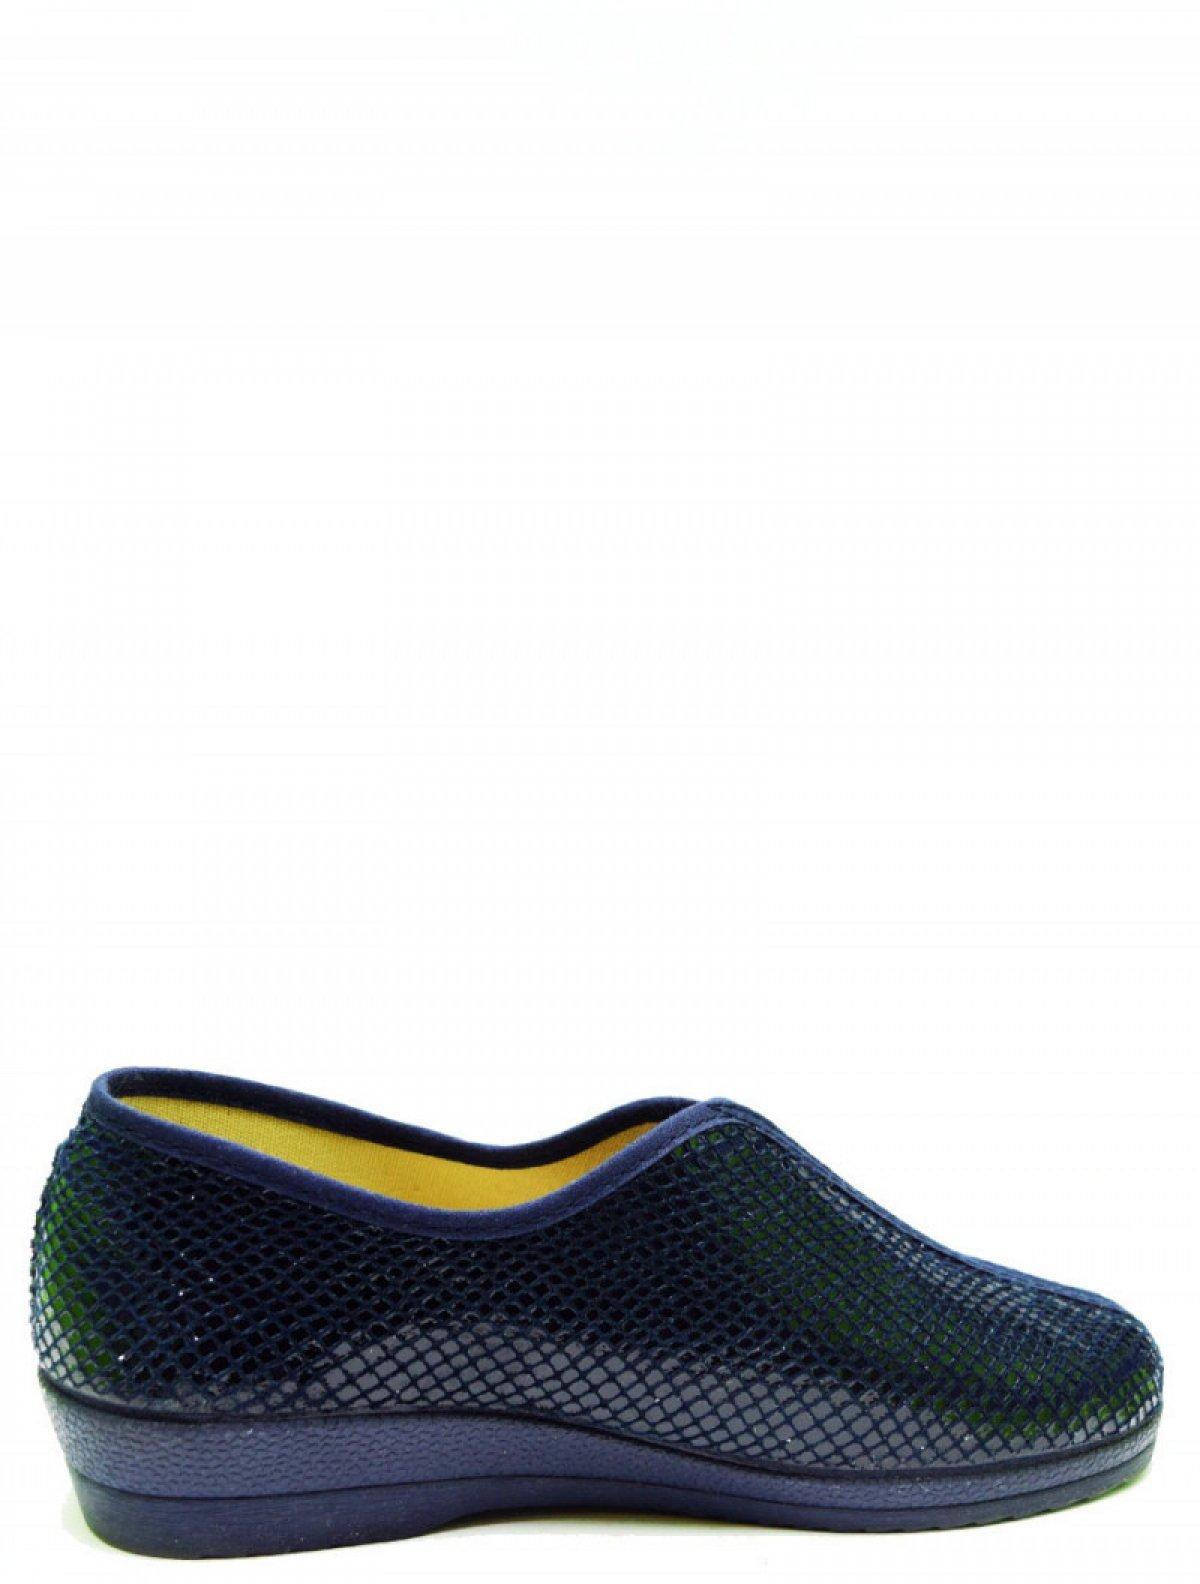 Imara Moda 179-4972410-805 женские туфли